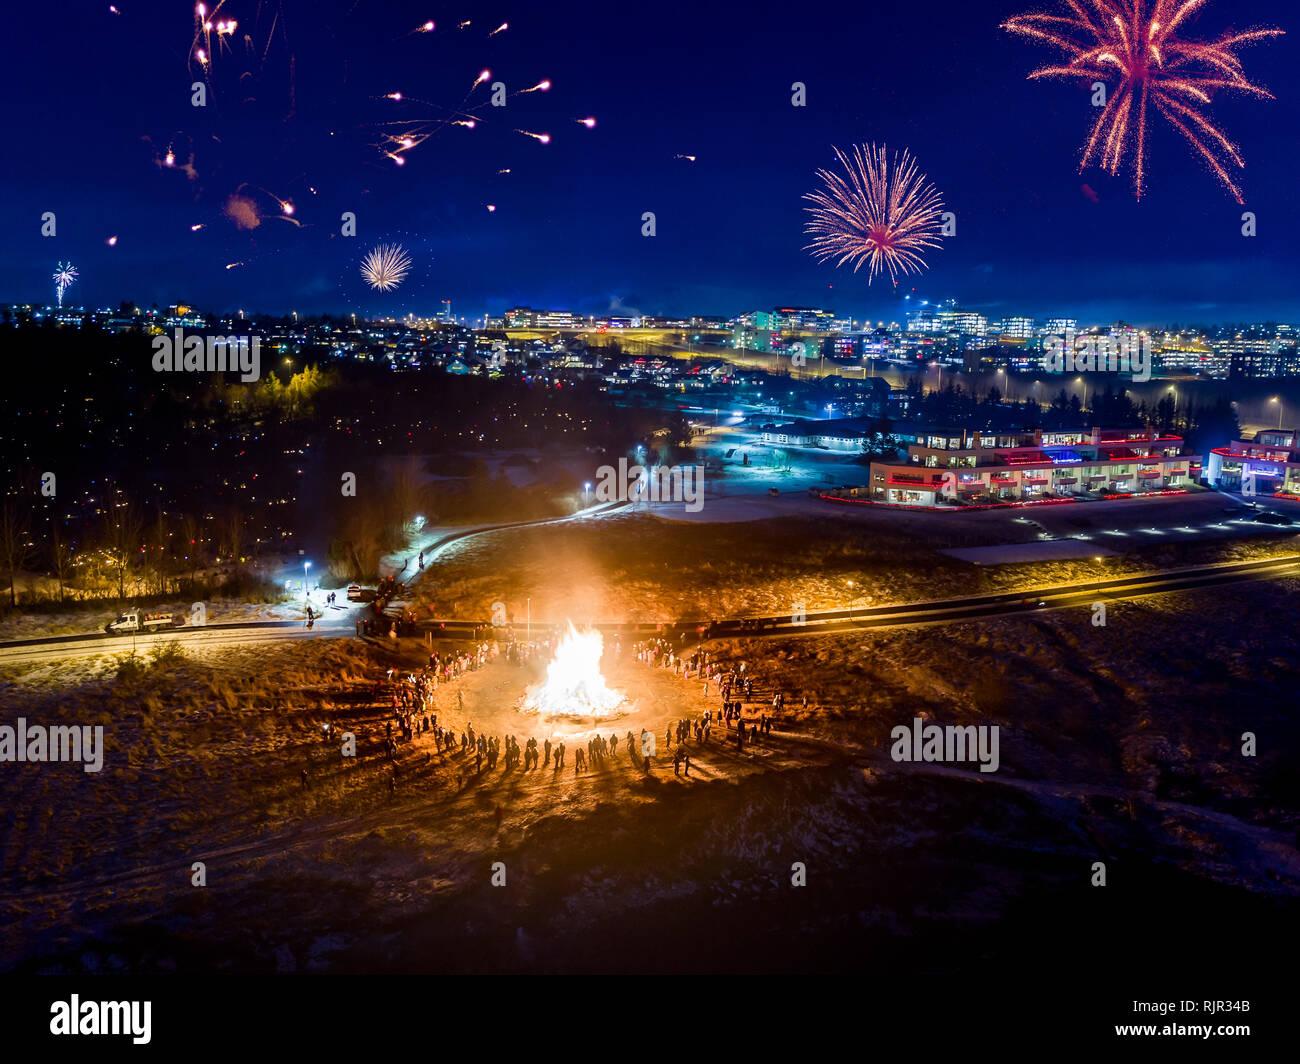 New Year's Eve Celebrations with bonfires and fireworks, Reykjavik, Iceland - Stock Image